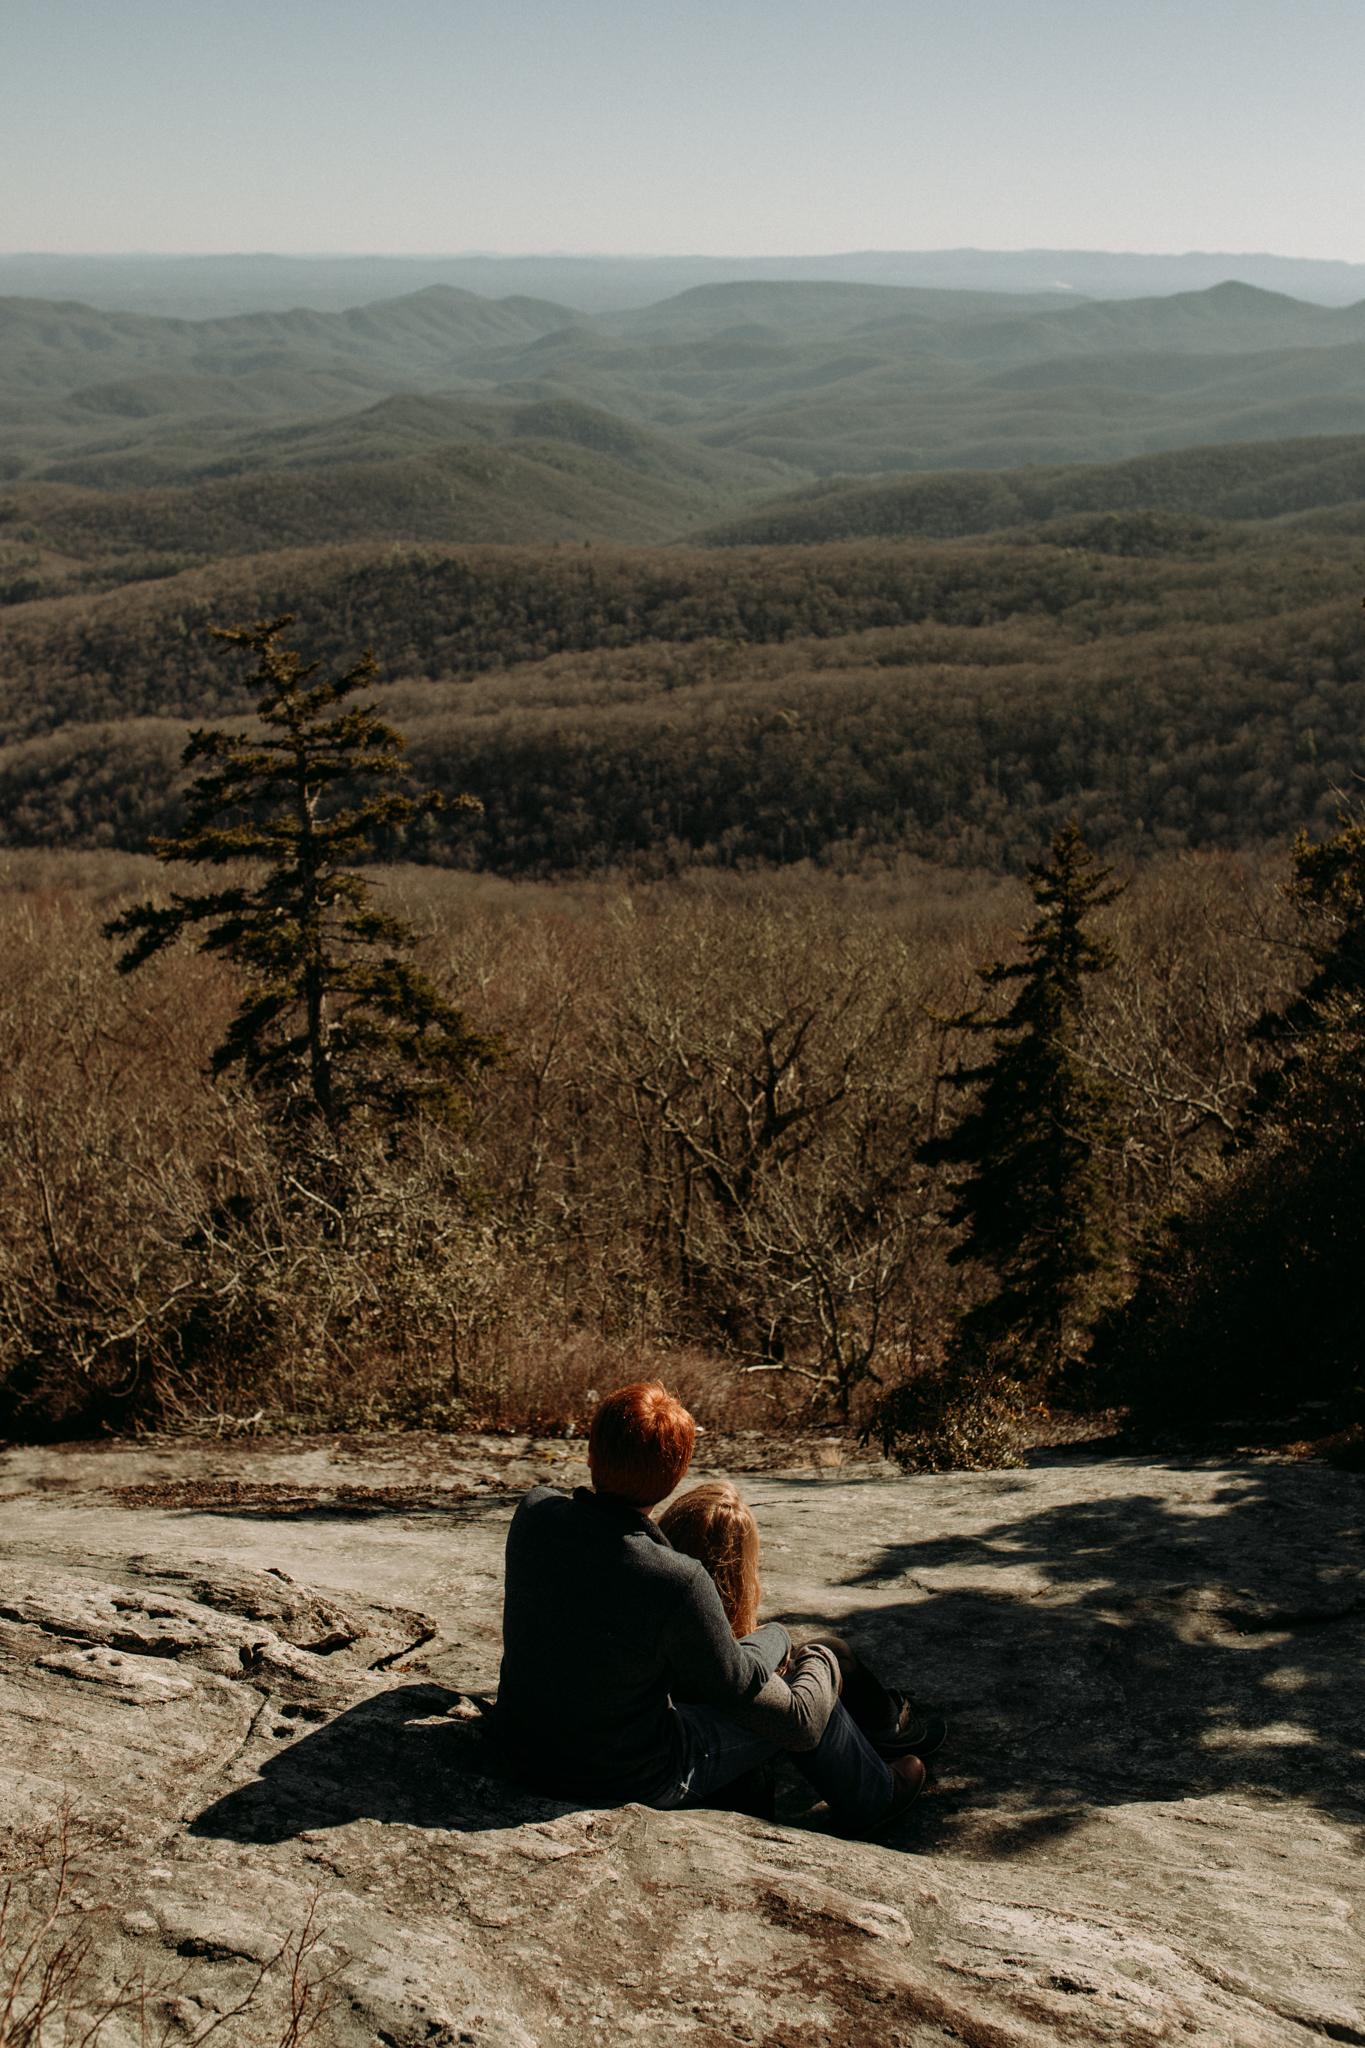 MonicaLeavellPhoto-AshleyMitch-NorthCarolina-Adventure-Engagement-Photographer-5.jpg